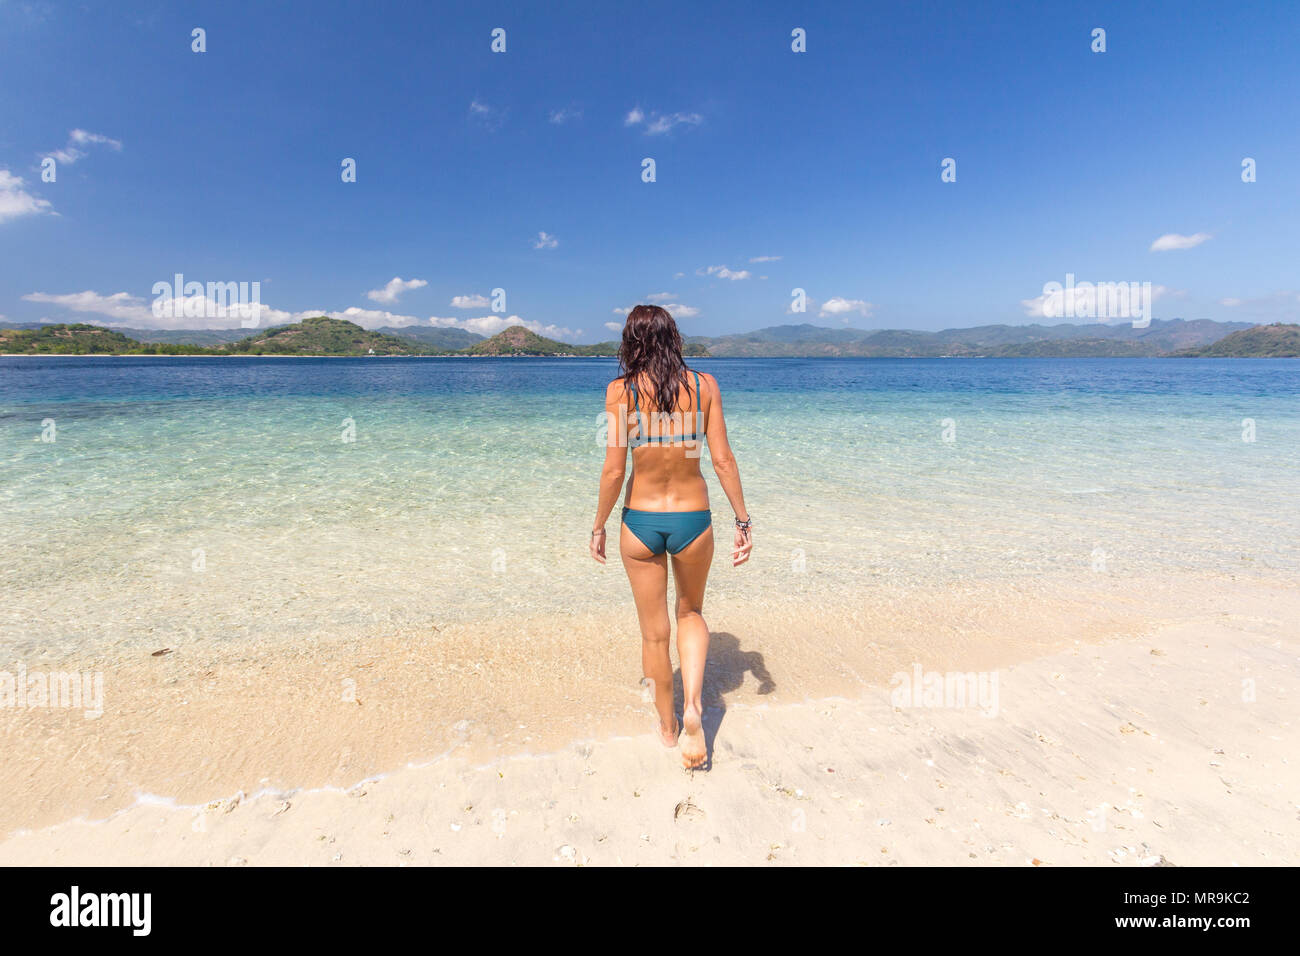 Girl on the beach, Gili island Lombok - Stock Image